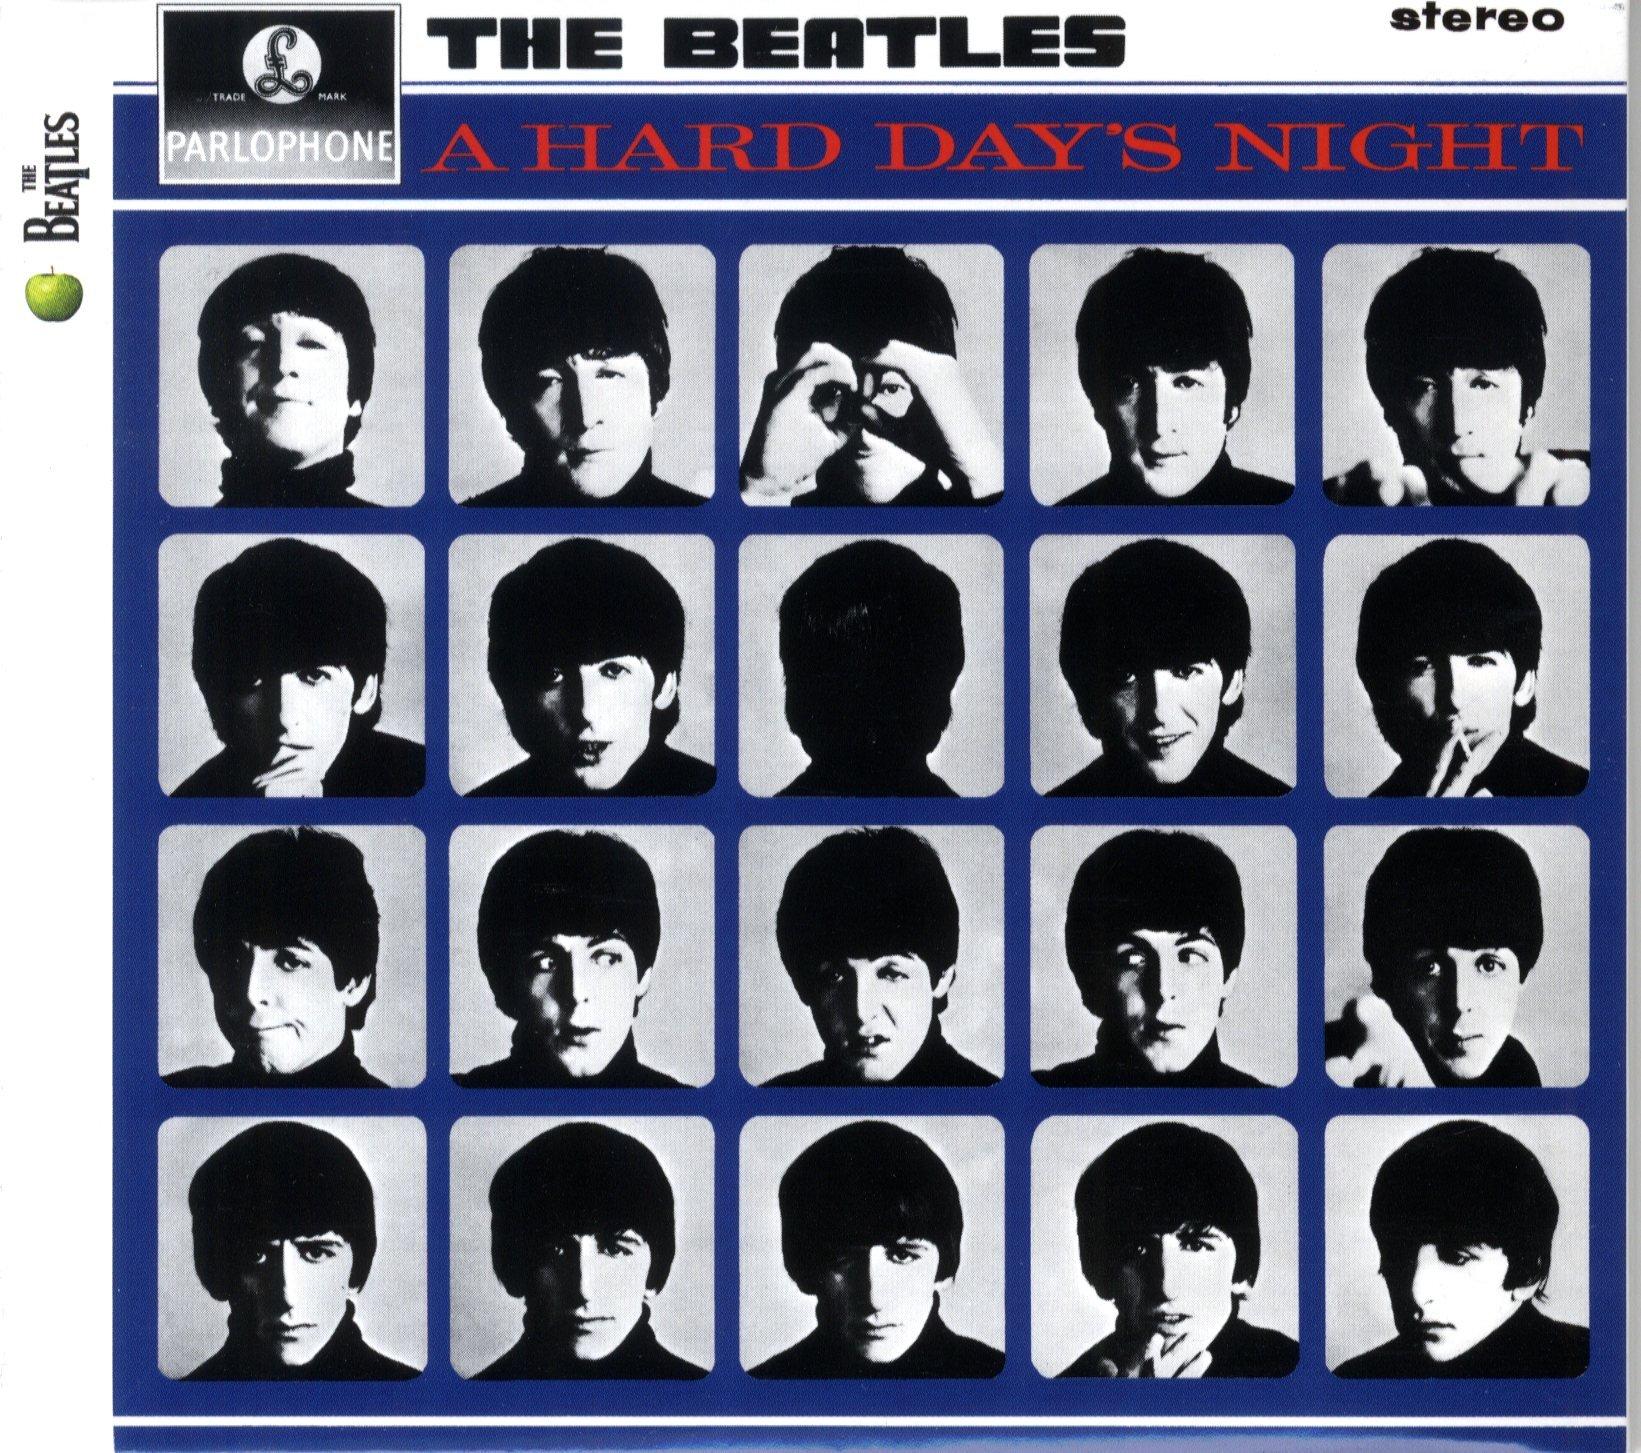 A Hard Day's Night by EMI Music